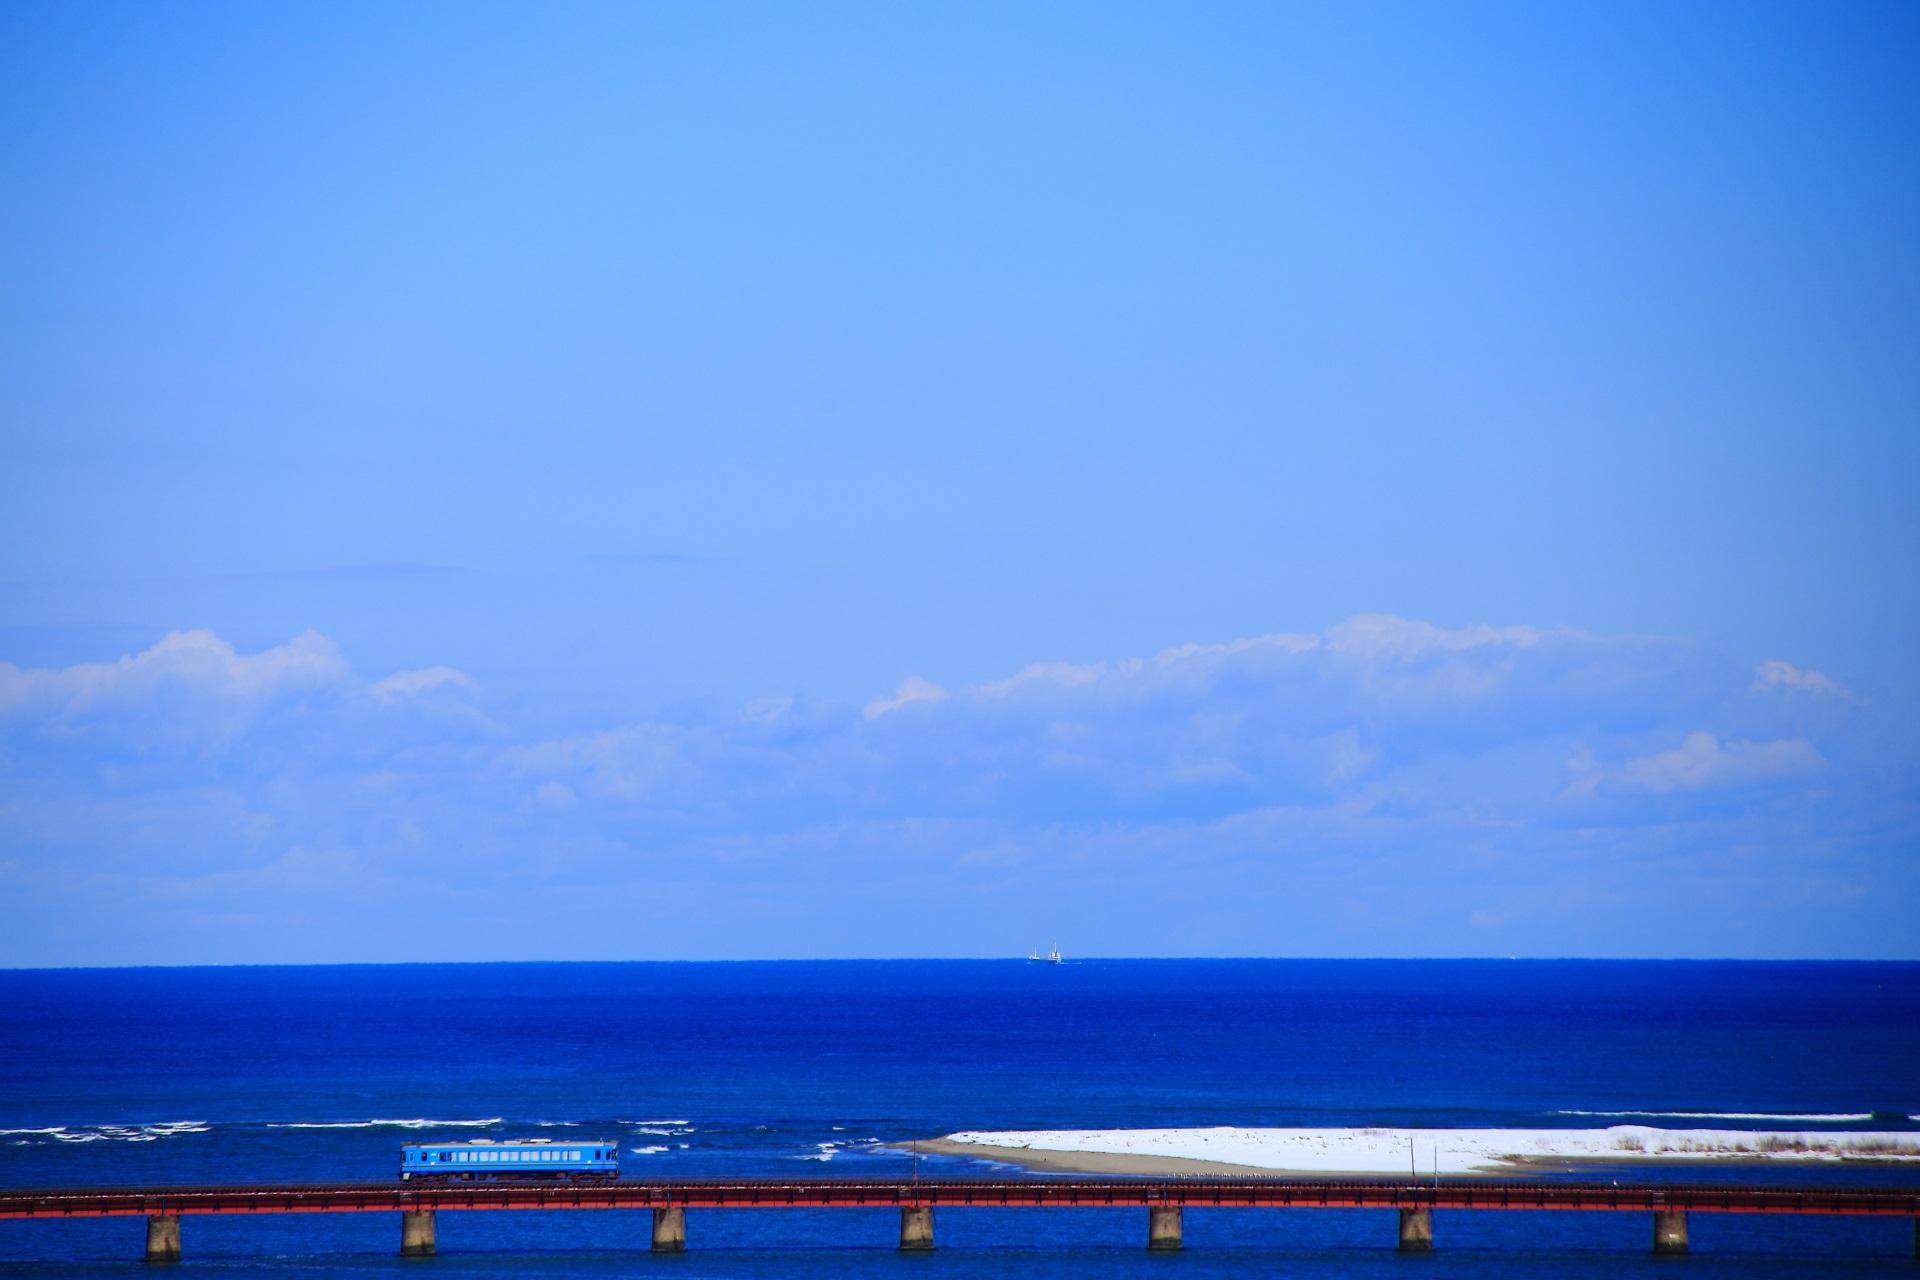 由良川橋梁 雪と青空 海を走る電車 京都丹後鉄道